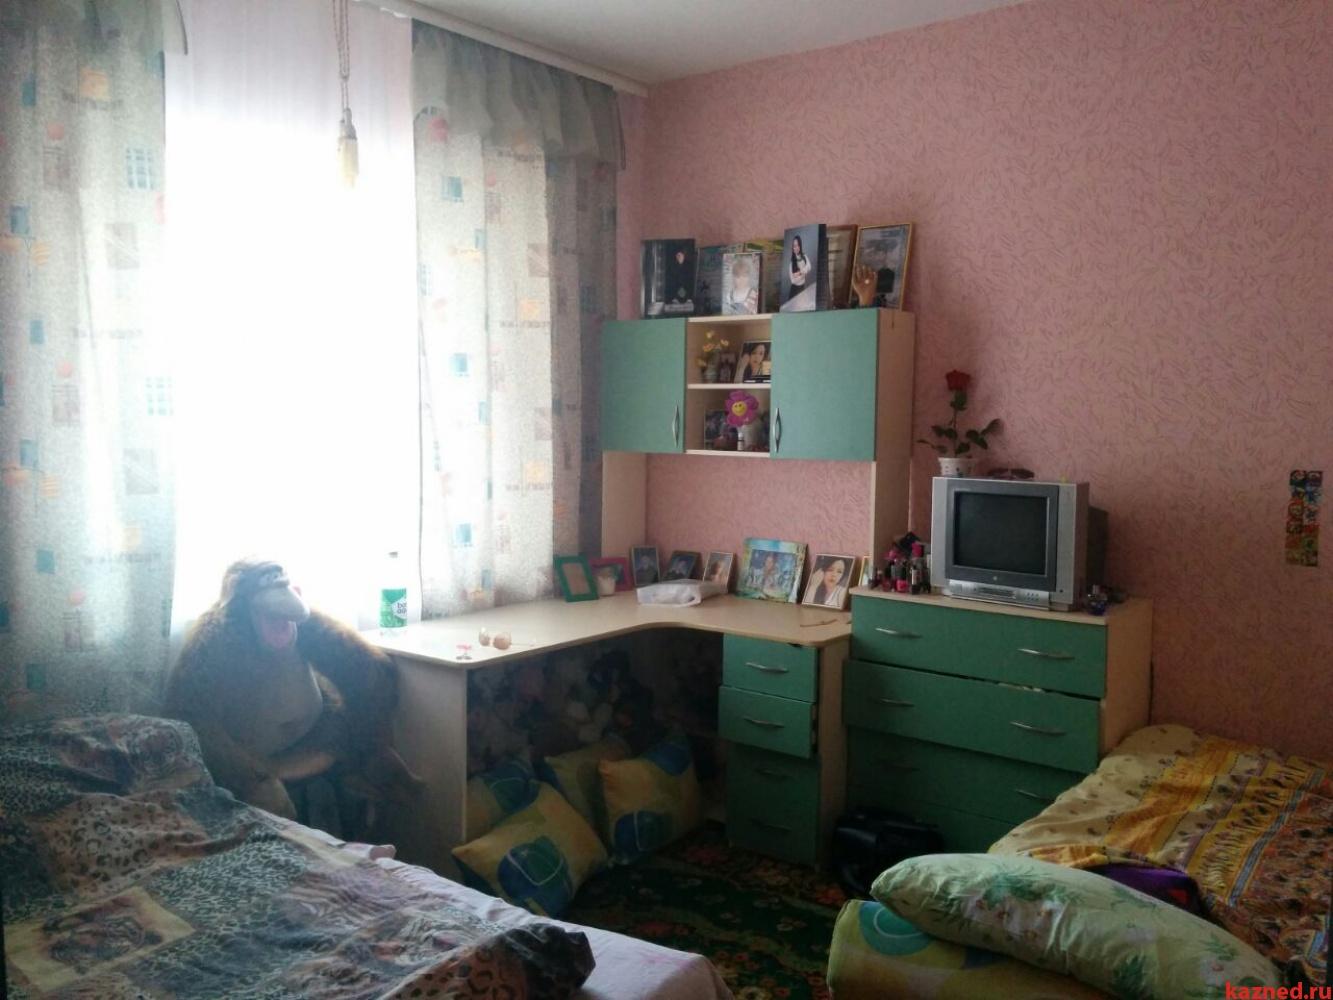 Продажа 3-к квартиры Гарифа Ахунова, 18, 88 м²  (миниатюра №11)